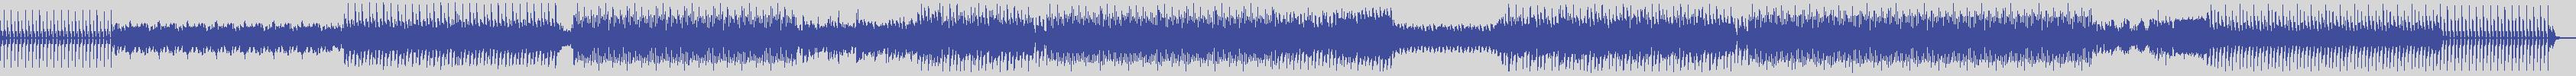 just_digital_records [JS1406] Sugar Freak - Music Change My Life [Great Exuma Vocal] audio wave form